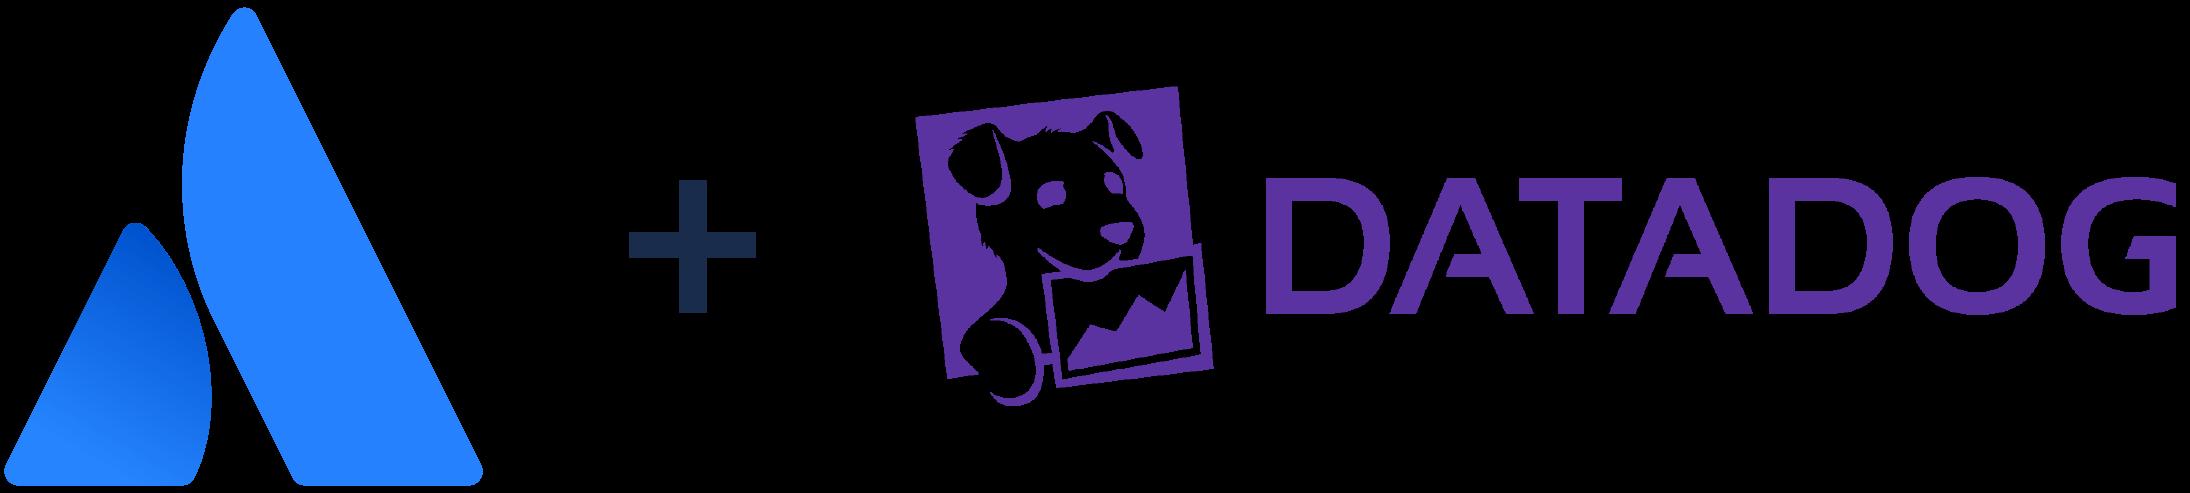 Atlassian-logo + Datadog-logo